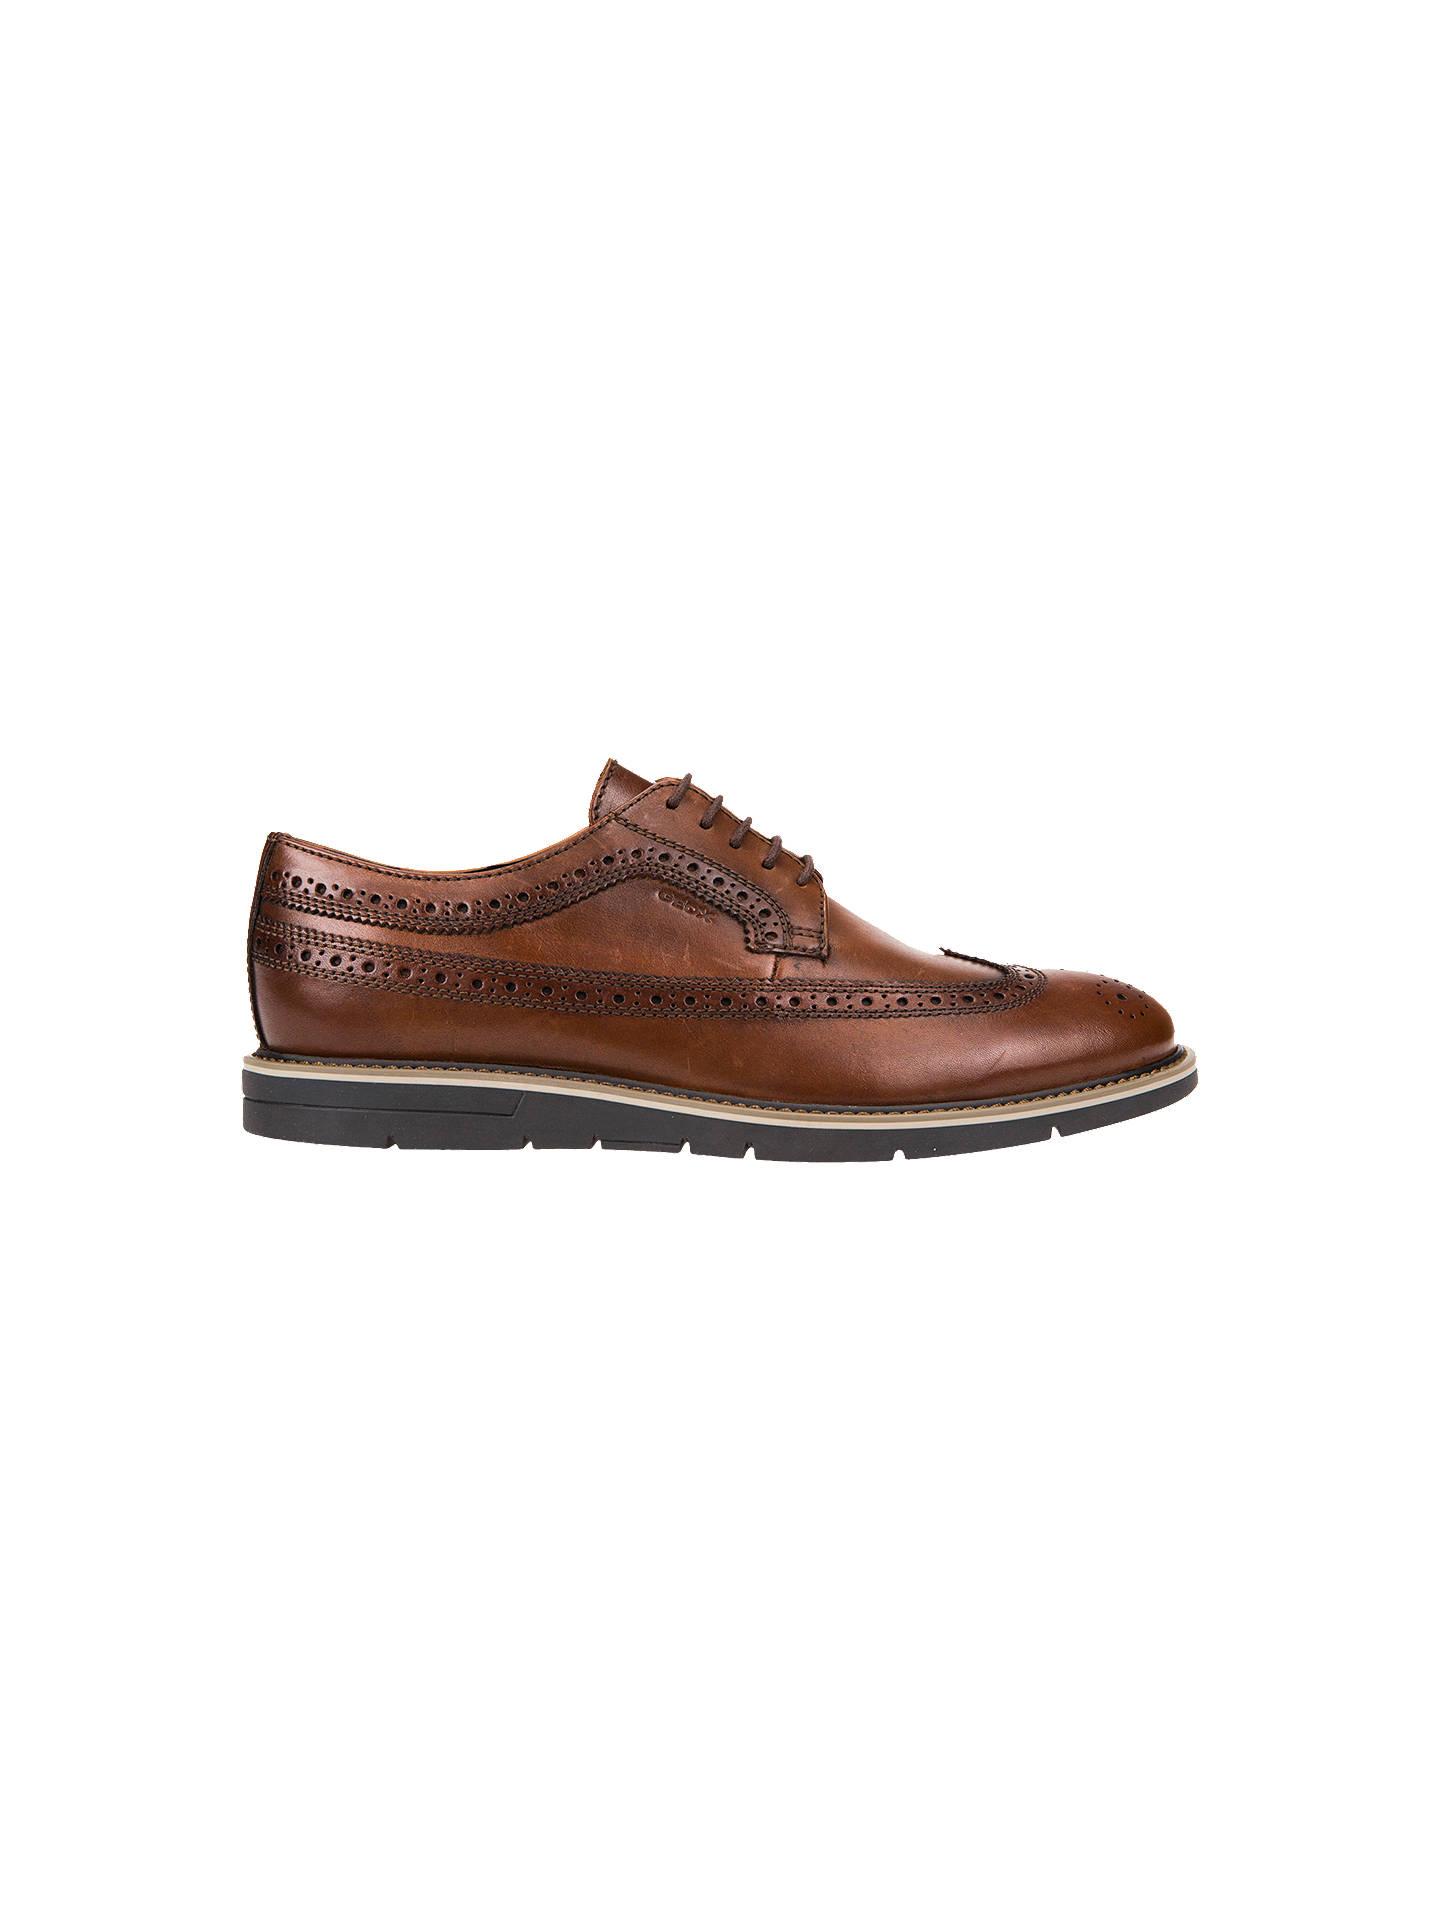 Anticuado Intacto Impresión  Geox Uvet Derby Shoes, Cognac at John Lewis & Partners